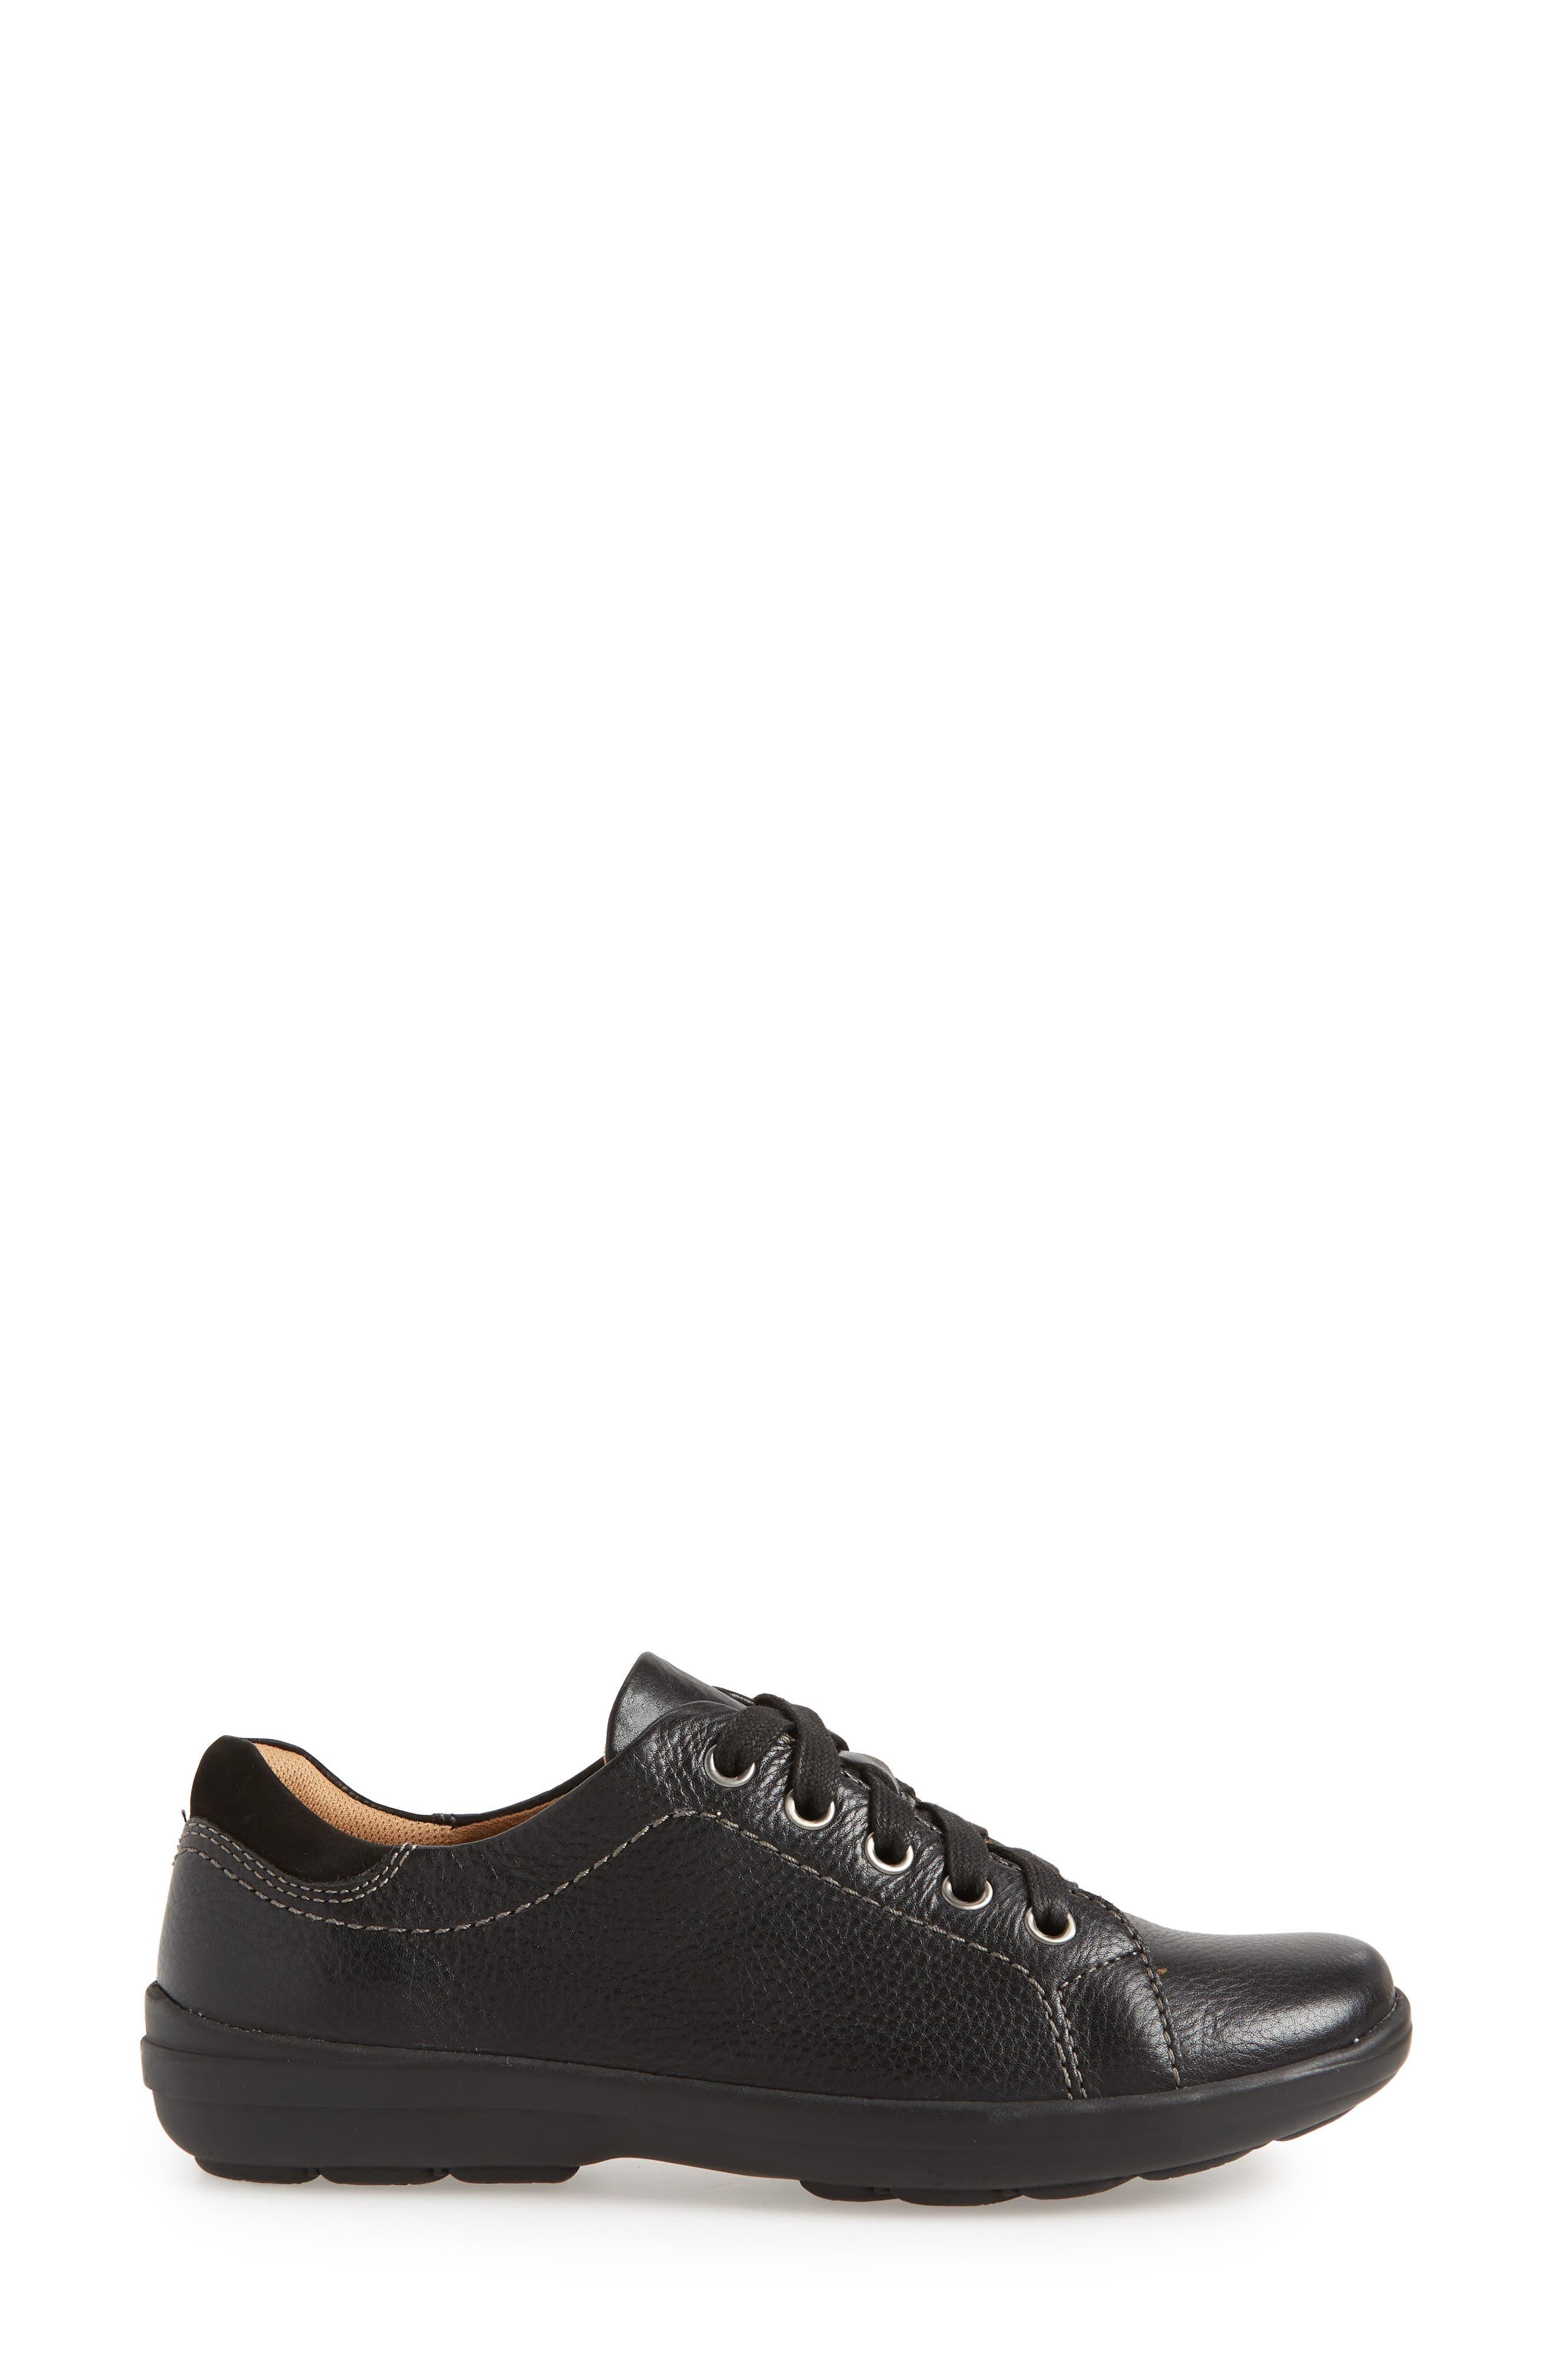 Reston Sneaker,                             Alternate thumbnail 3, color,                             BLACK